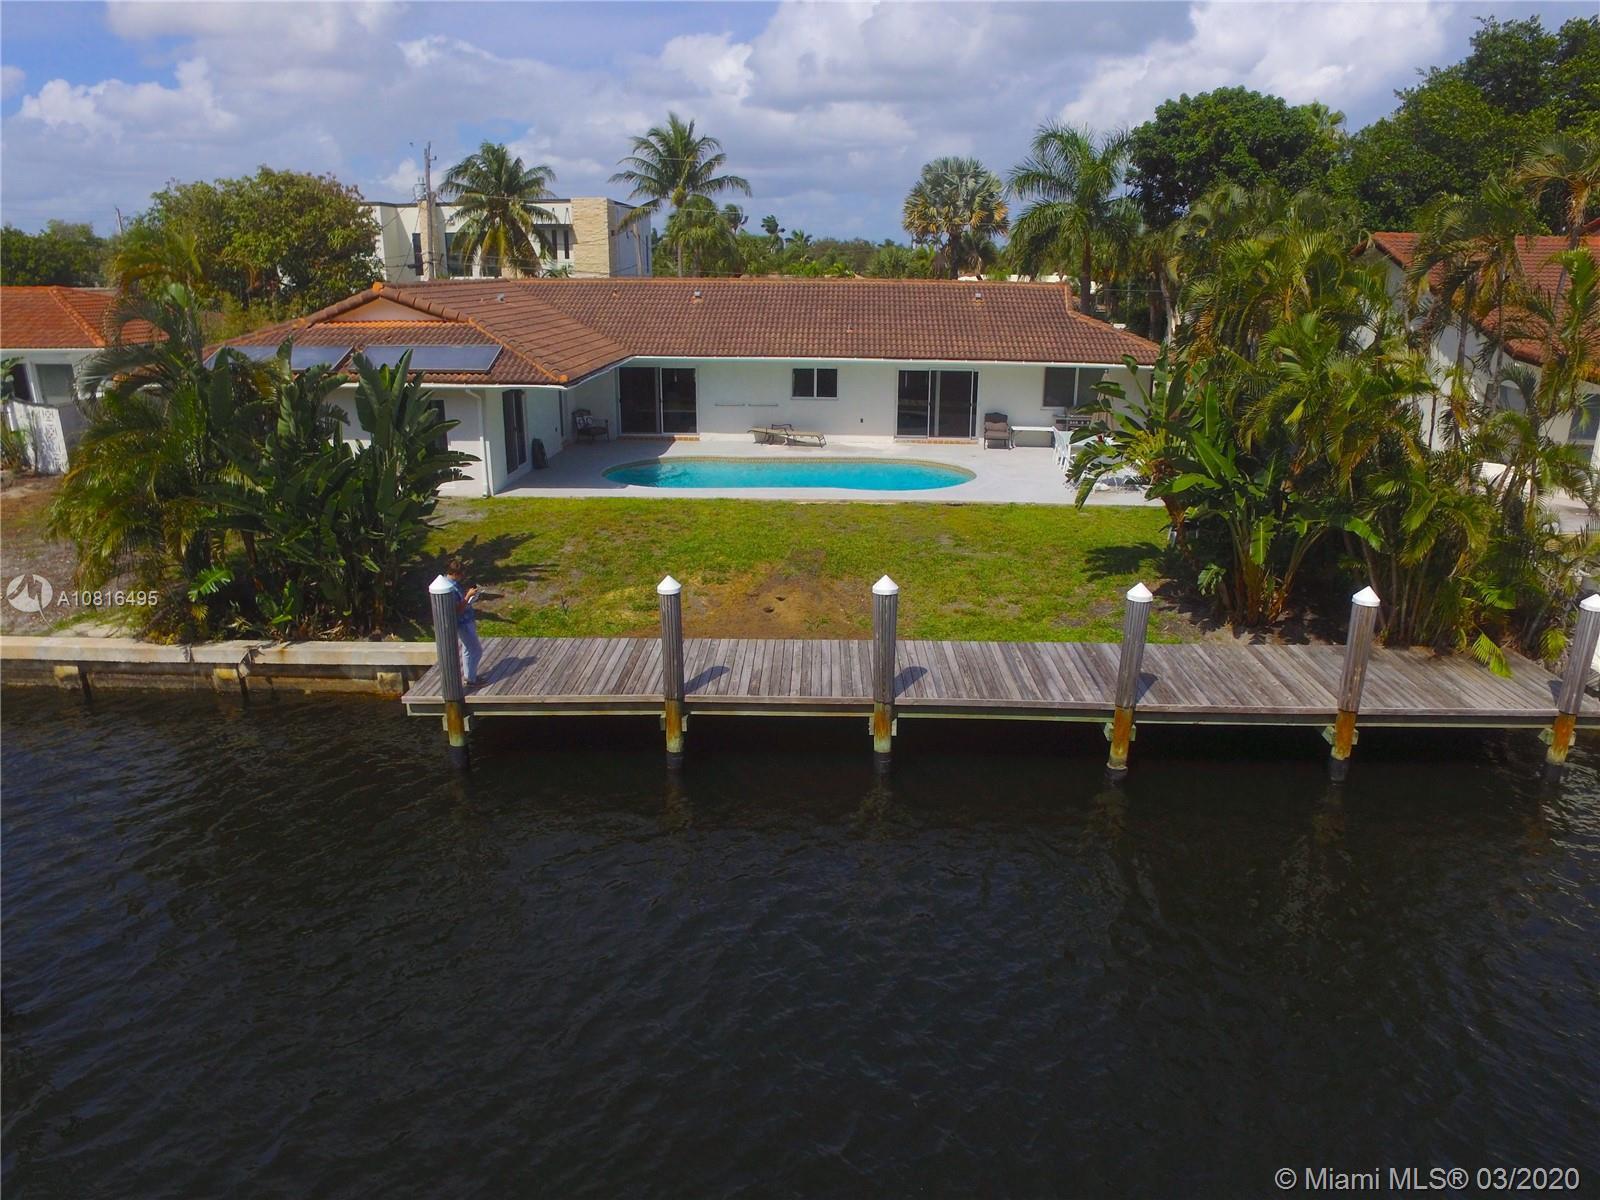 2824 NE 35th St Property Photo - Fort Lauderdale, FL real estate listing